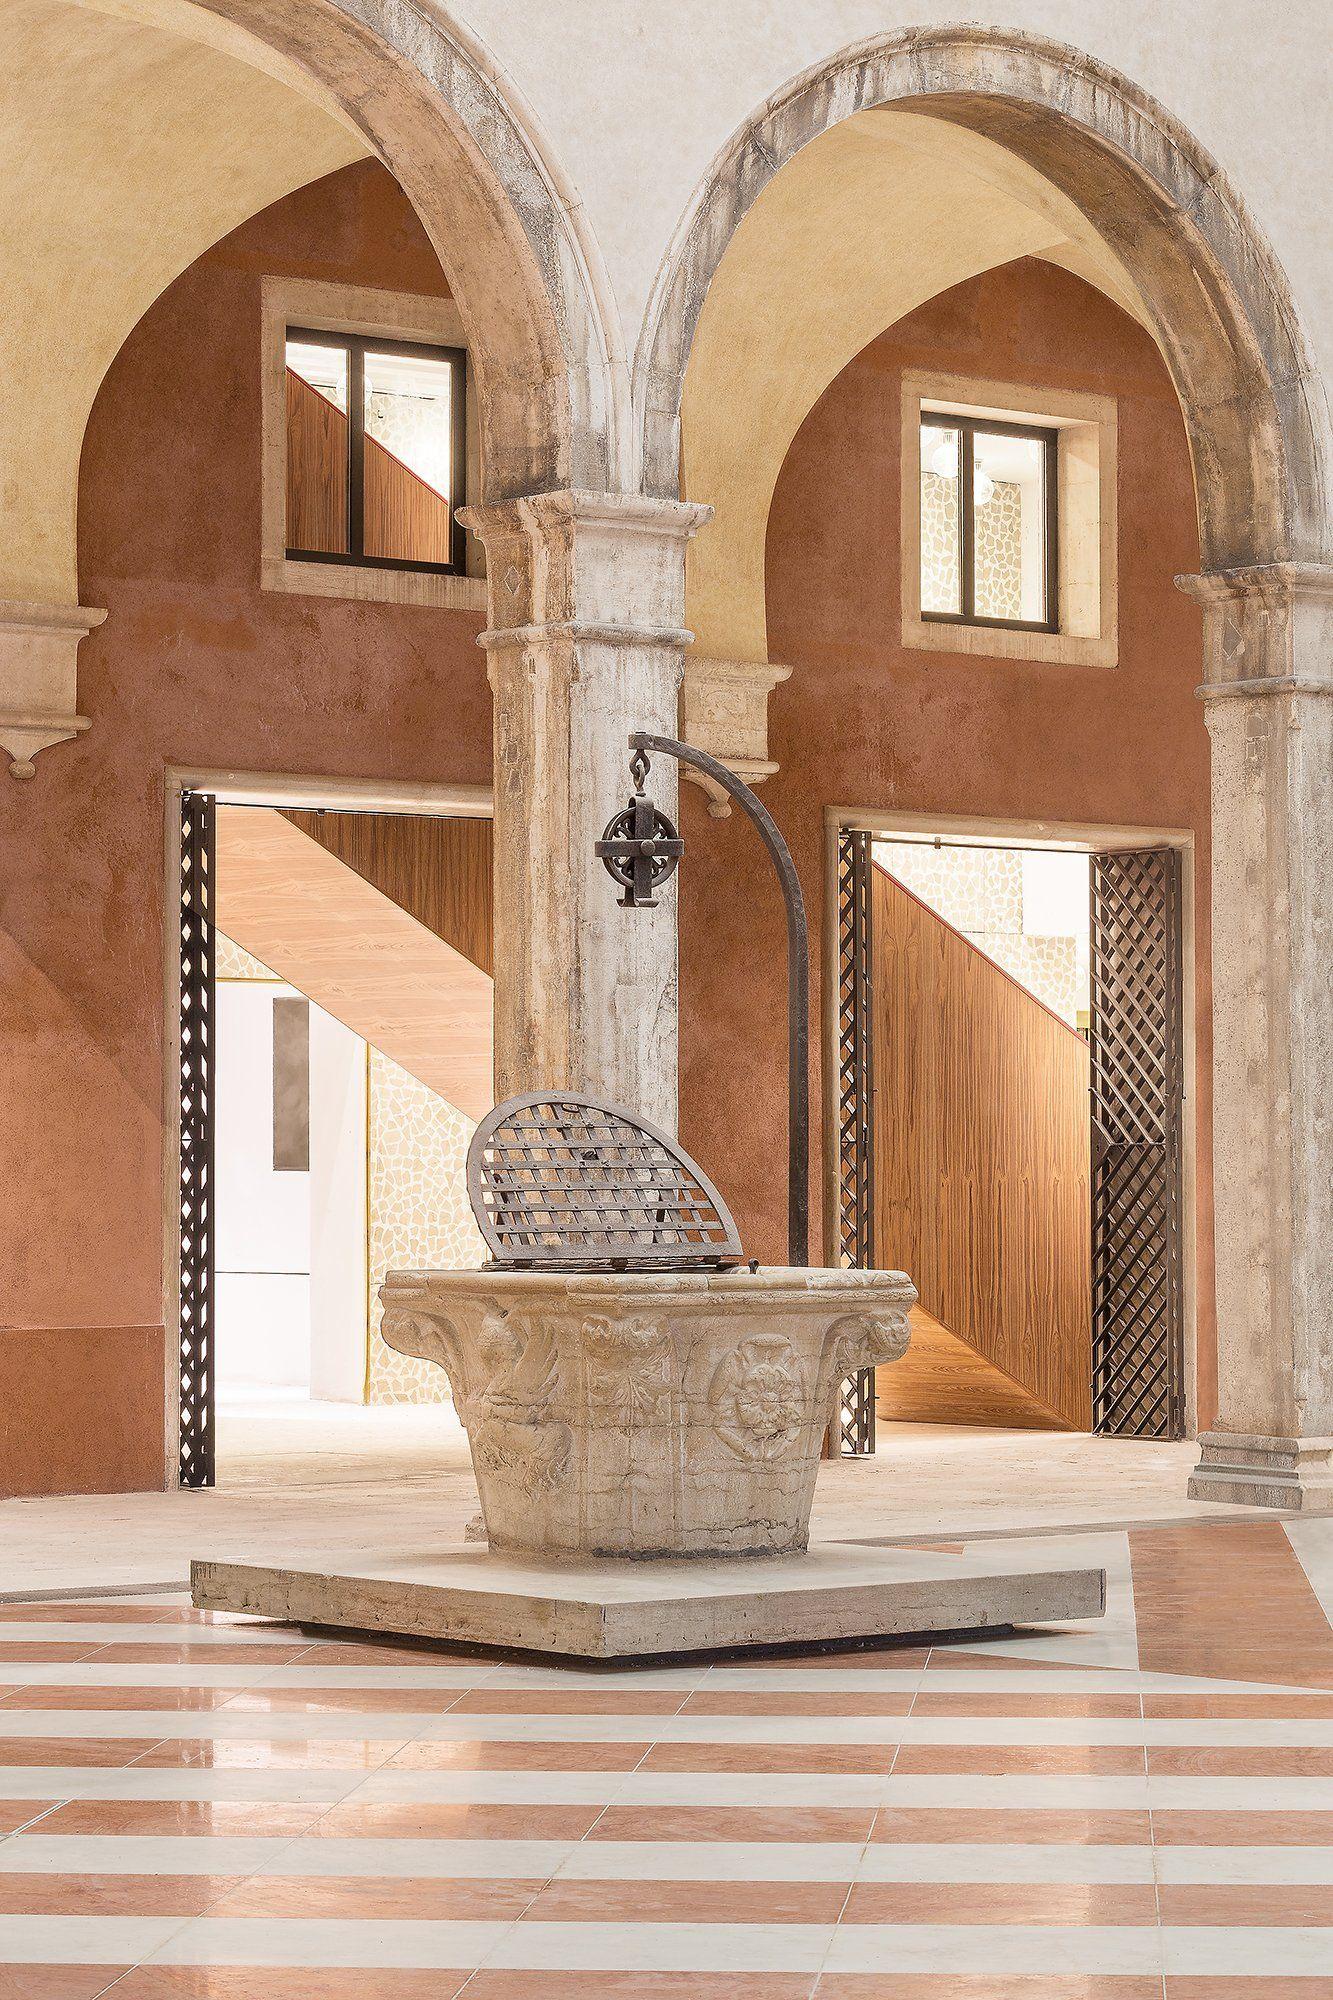 The Fondaco dei Tedeschi, Italia - Rem Koolhaas - Office for Metropolitan Architecture (OMA)